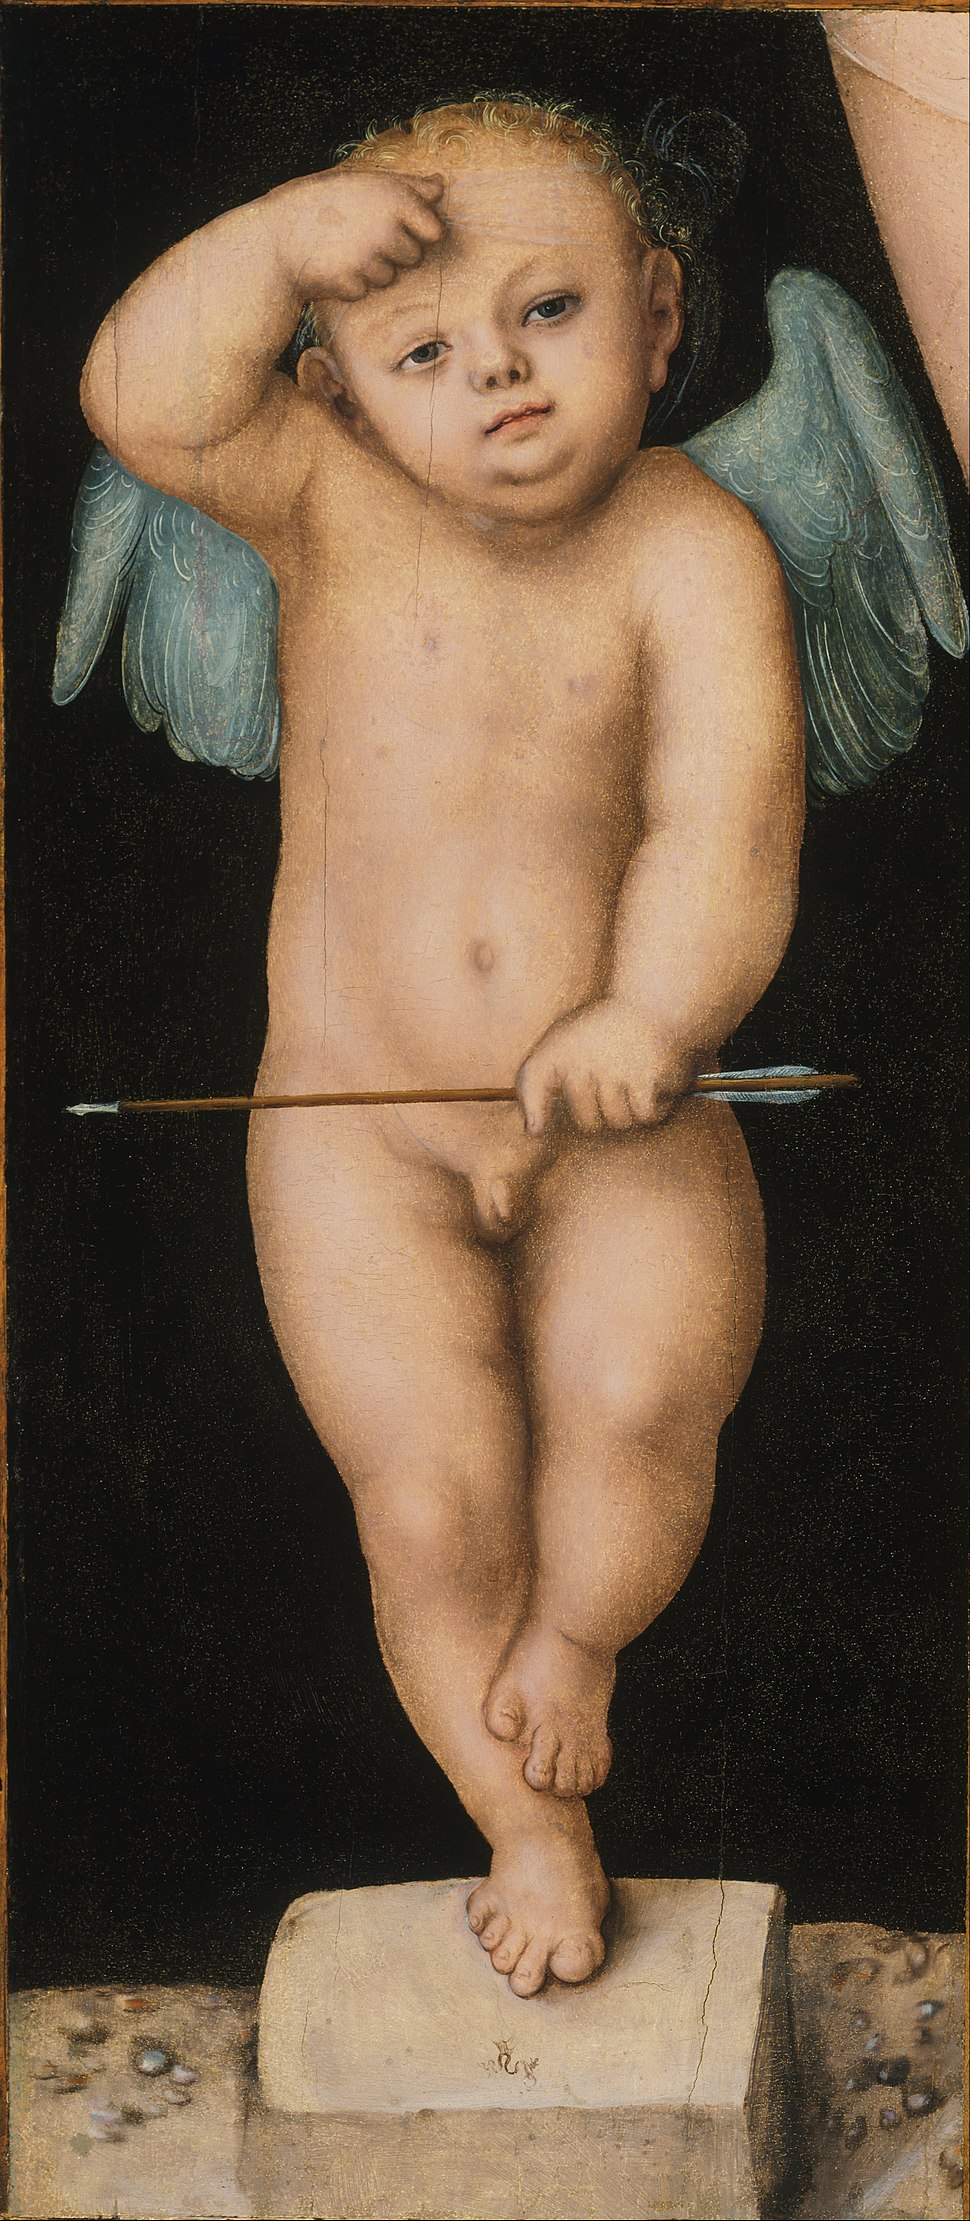 Lucas Cranach the Elder, German (active Vienna, Wittenberg, and Weimar) - Cupid - Google Art Project